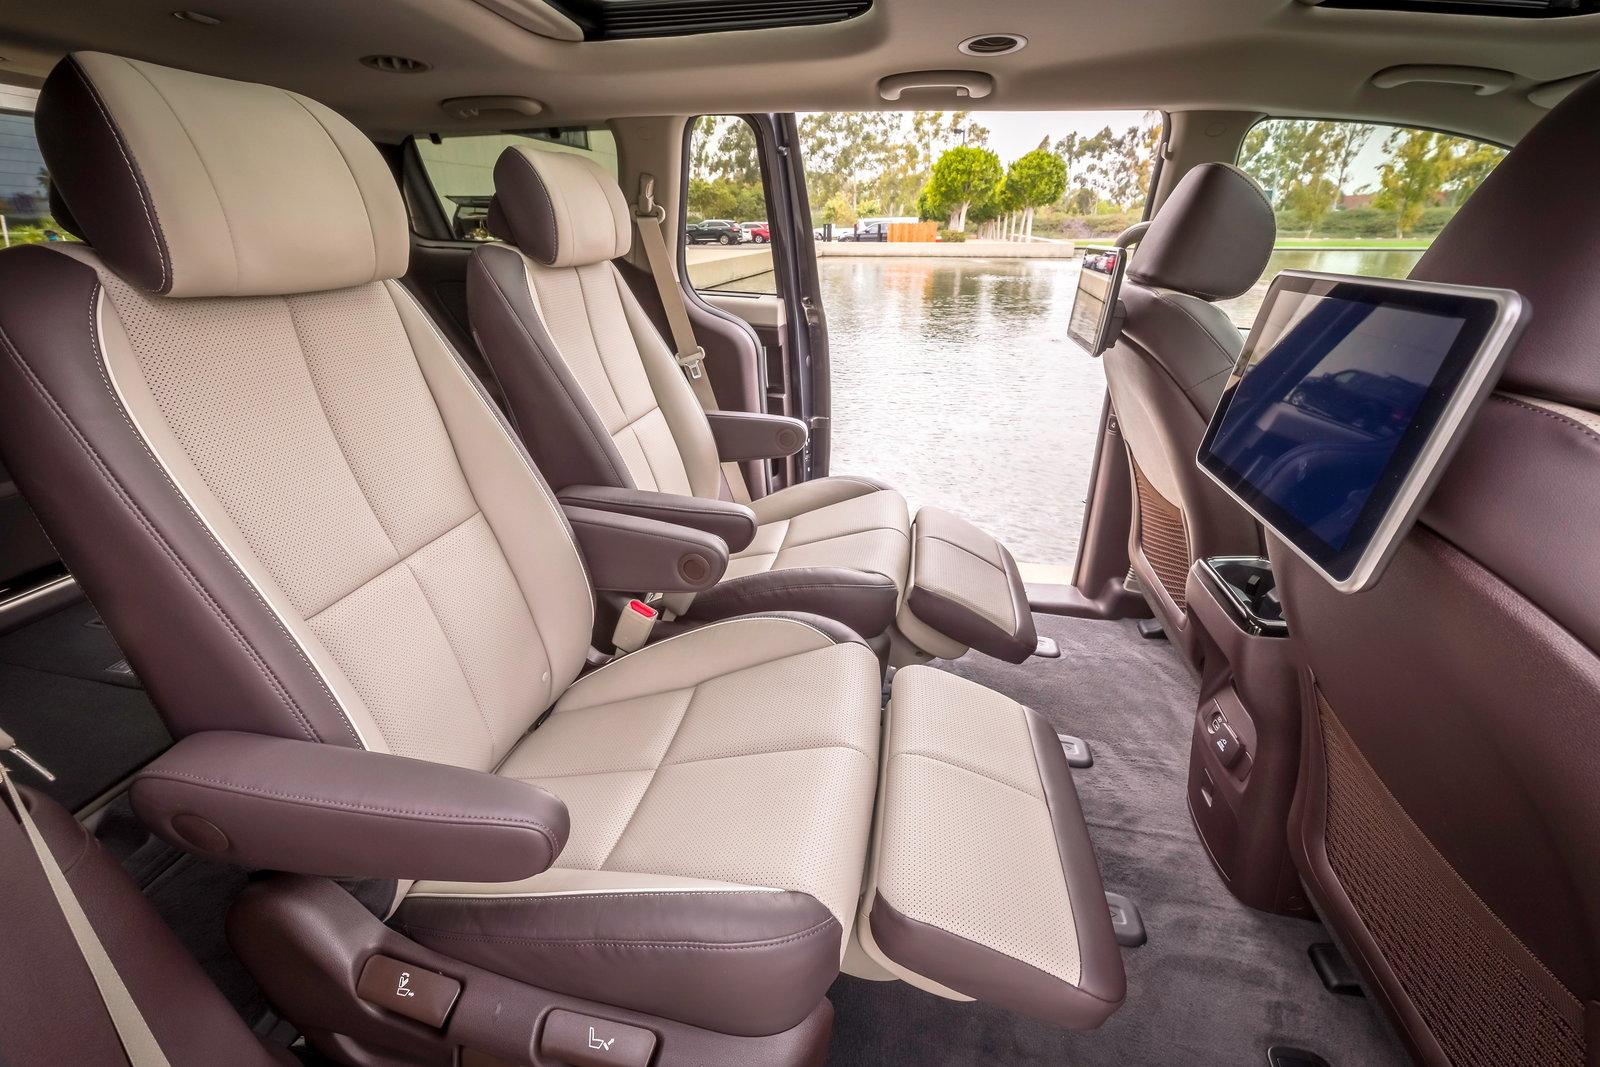 2019 Kia Sedona: Preview, Pricing, Release Date